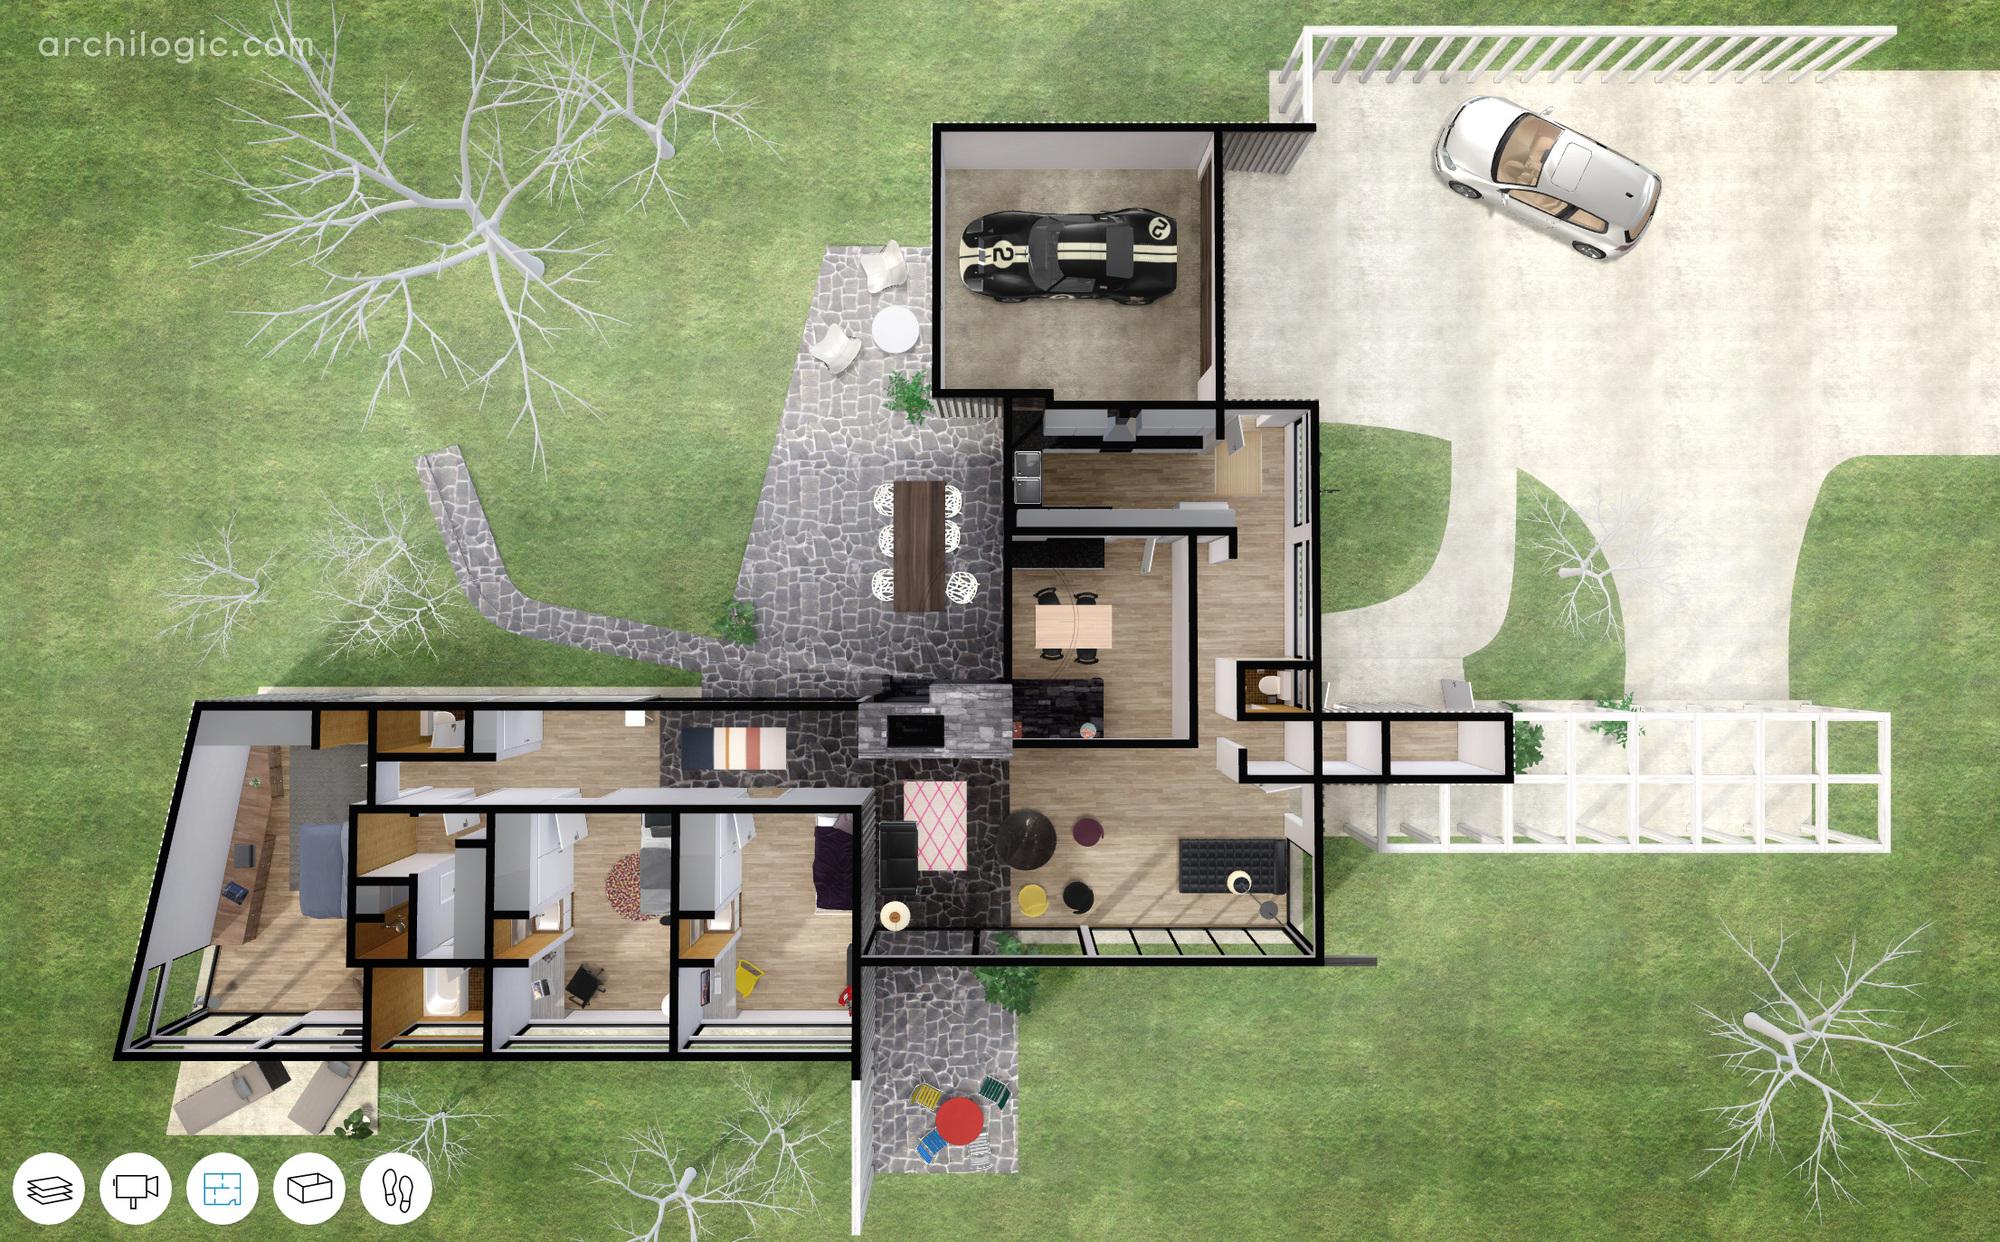 583de050e58ecefe37000073 A Virtual Look Into Richard Neutras Unbuilt Case Study House Number 13 The Alpha House Image on Small Salon Floor Plans